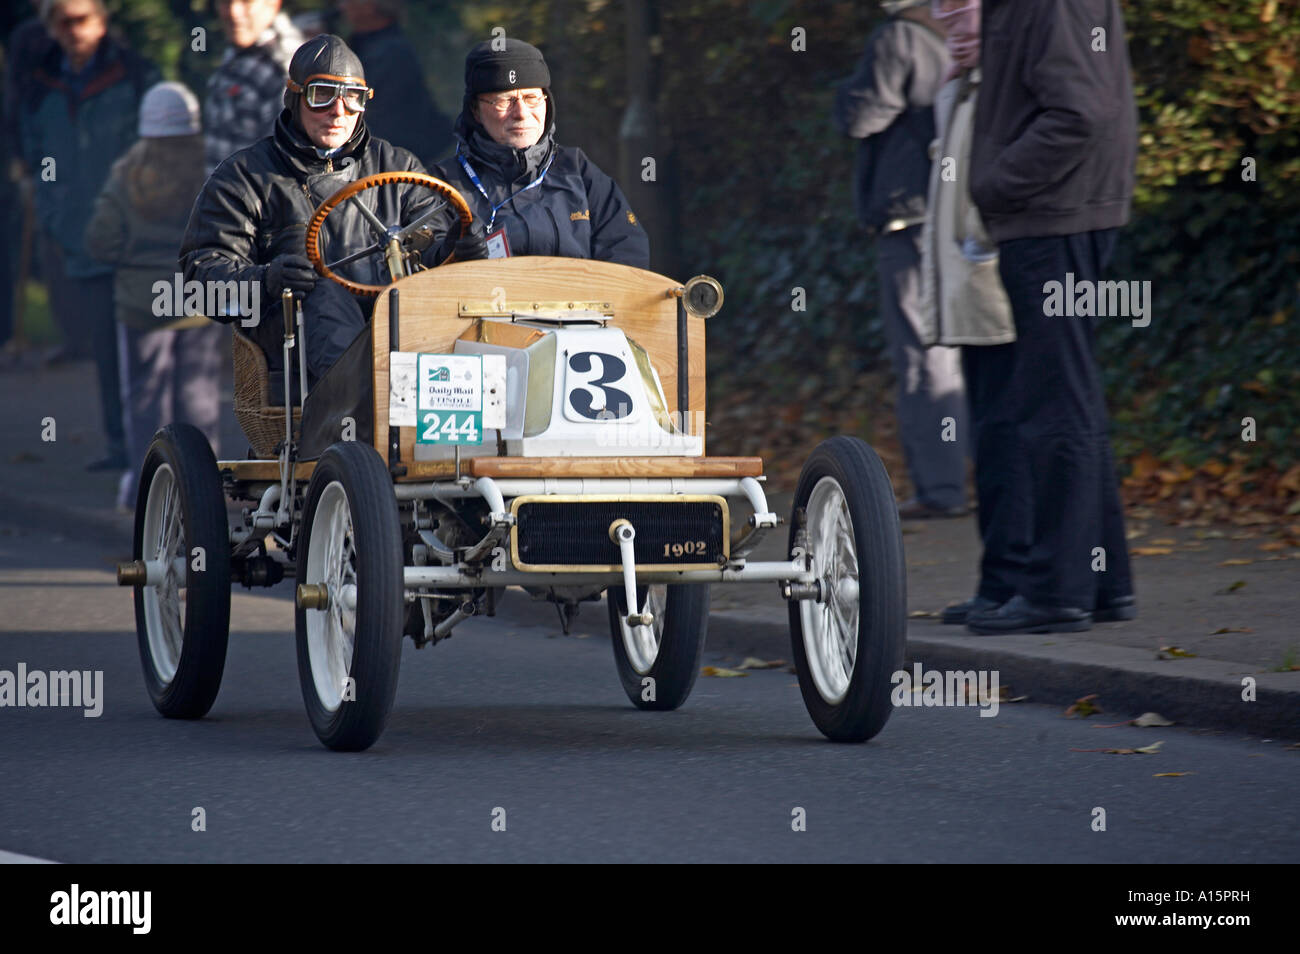 1903 De Dion Bouton Special in the 2006 London to Brighton Veteran car run - Stock Image